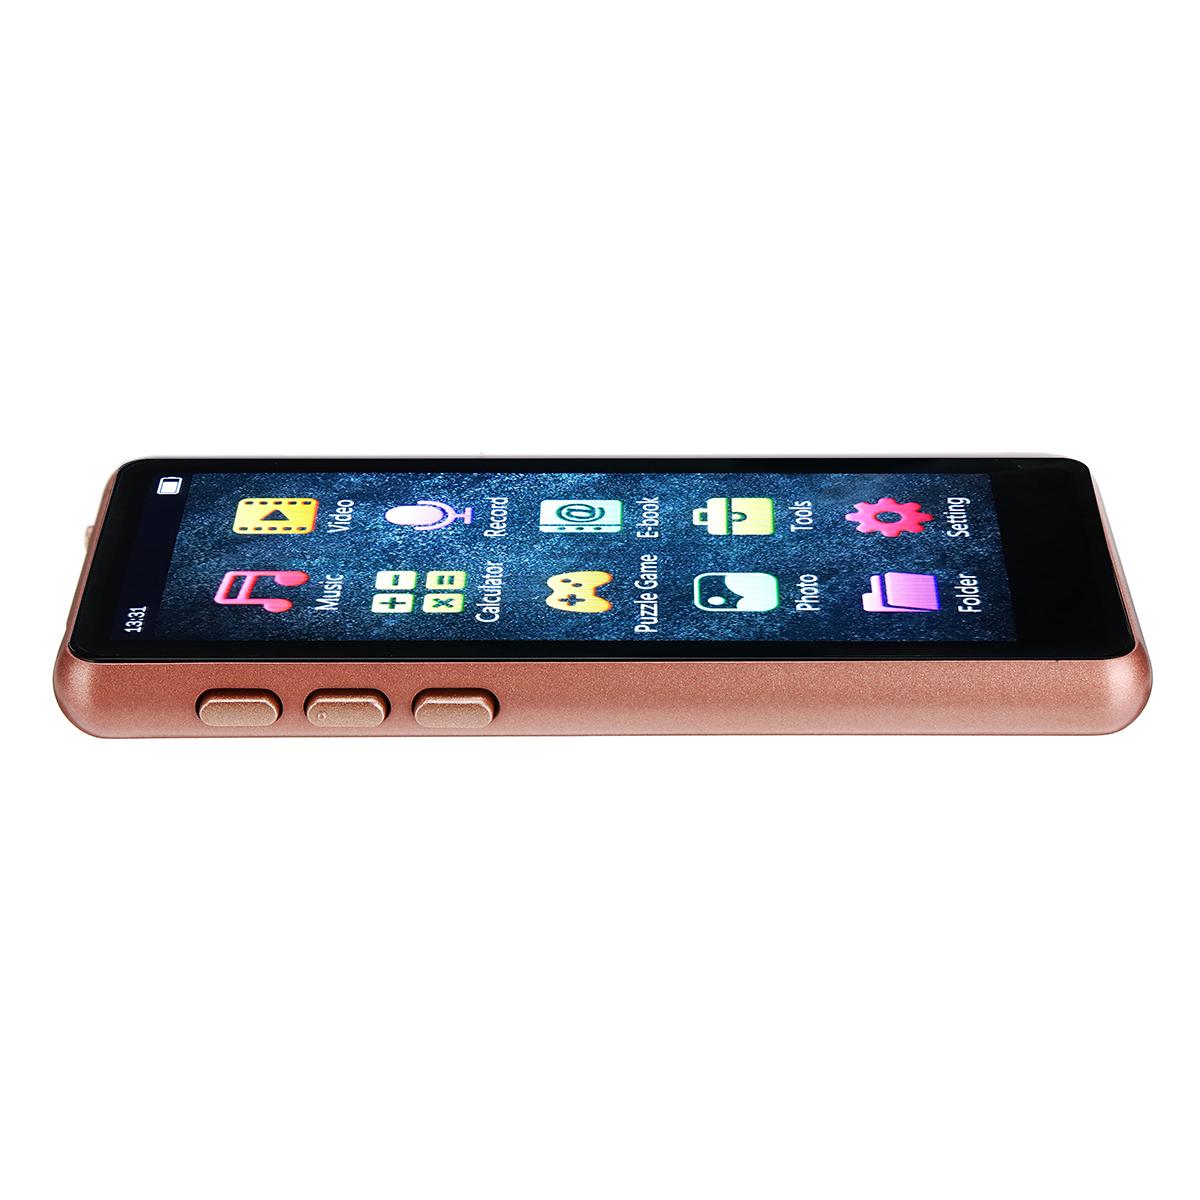 Mahdi M9 bluetooth 5.0 8GB Lossless MP3 MP4 Player 3.5inch HD IPS Full Screen External Speaker Ebook TF Card Music Player